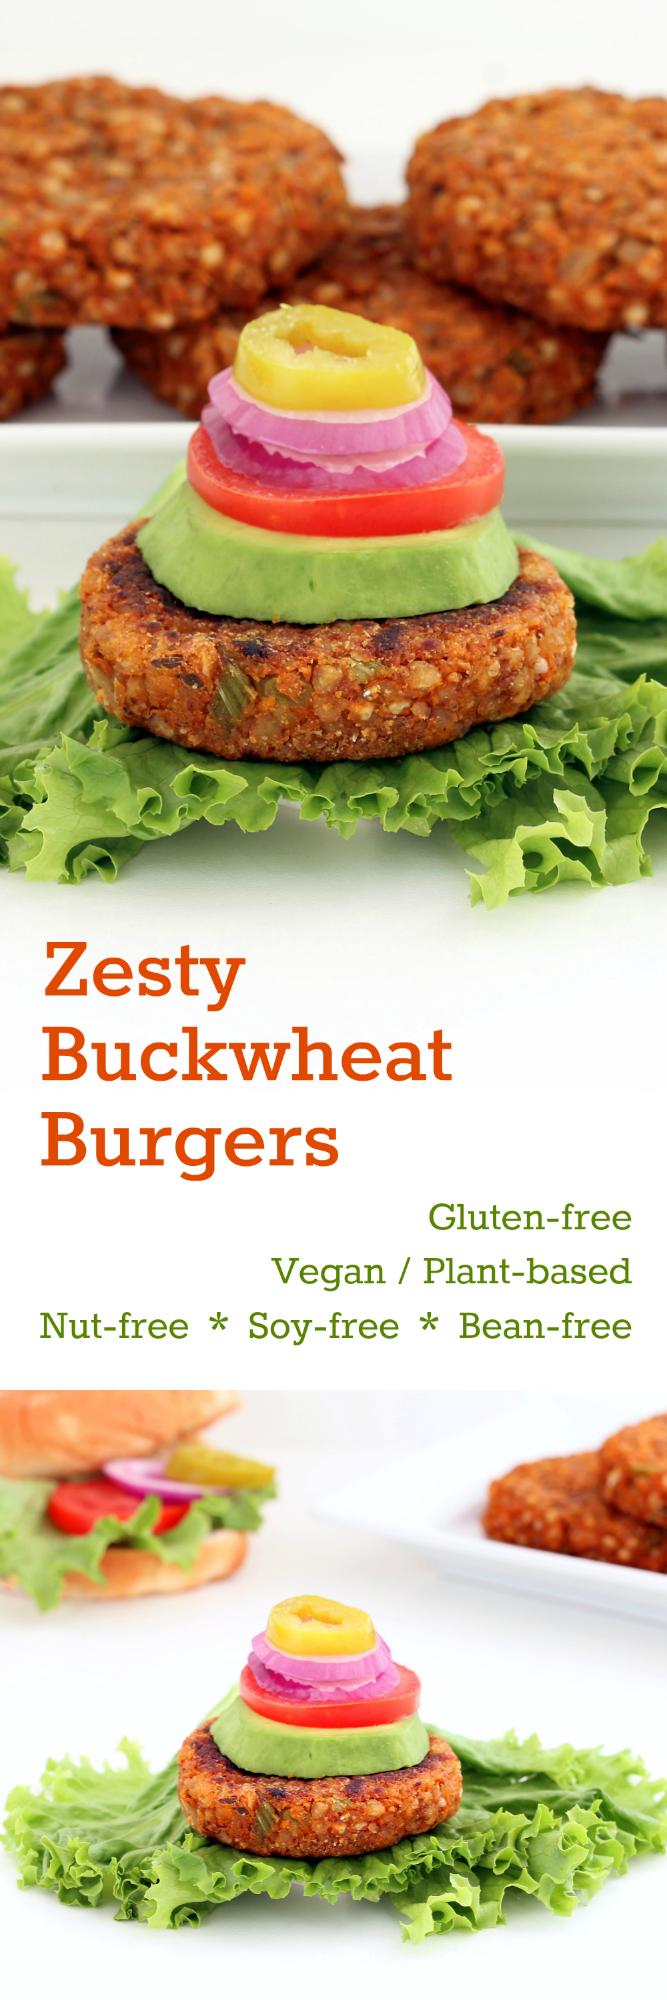 Zesty Buckwheat Burgers Vegan And Gluten Free Veggie